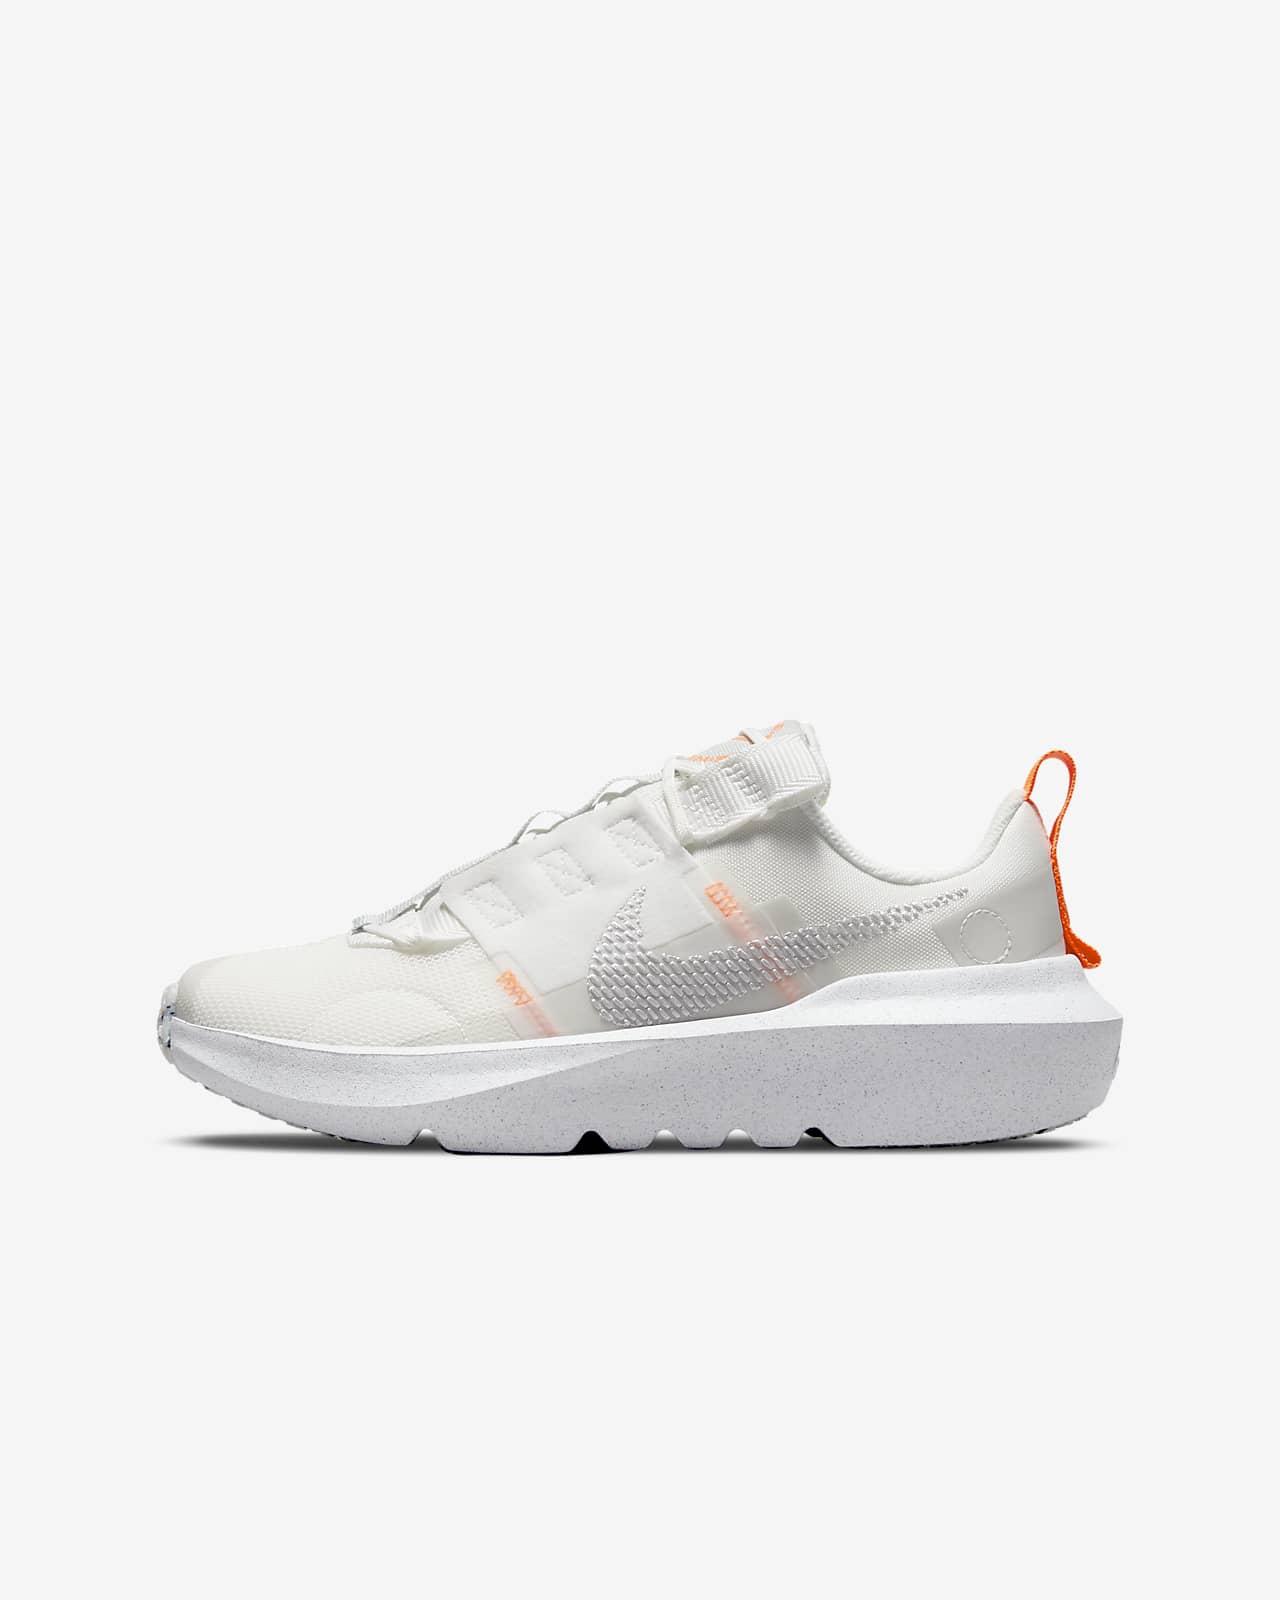 Nike Crater Impact Schuh für ältere Kinder